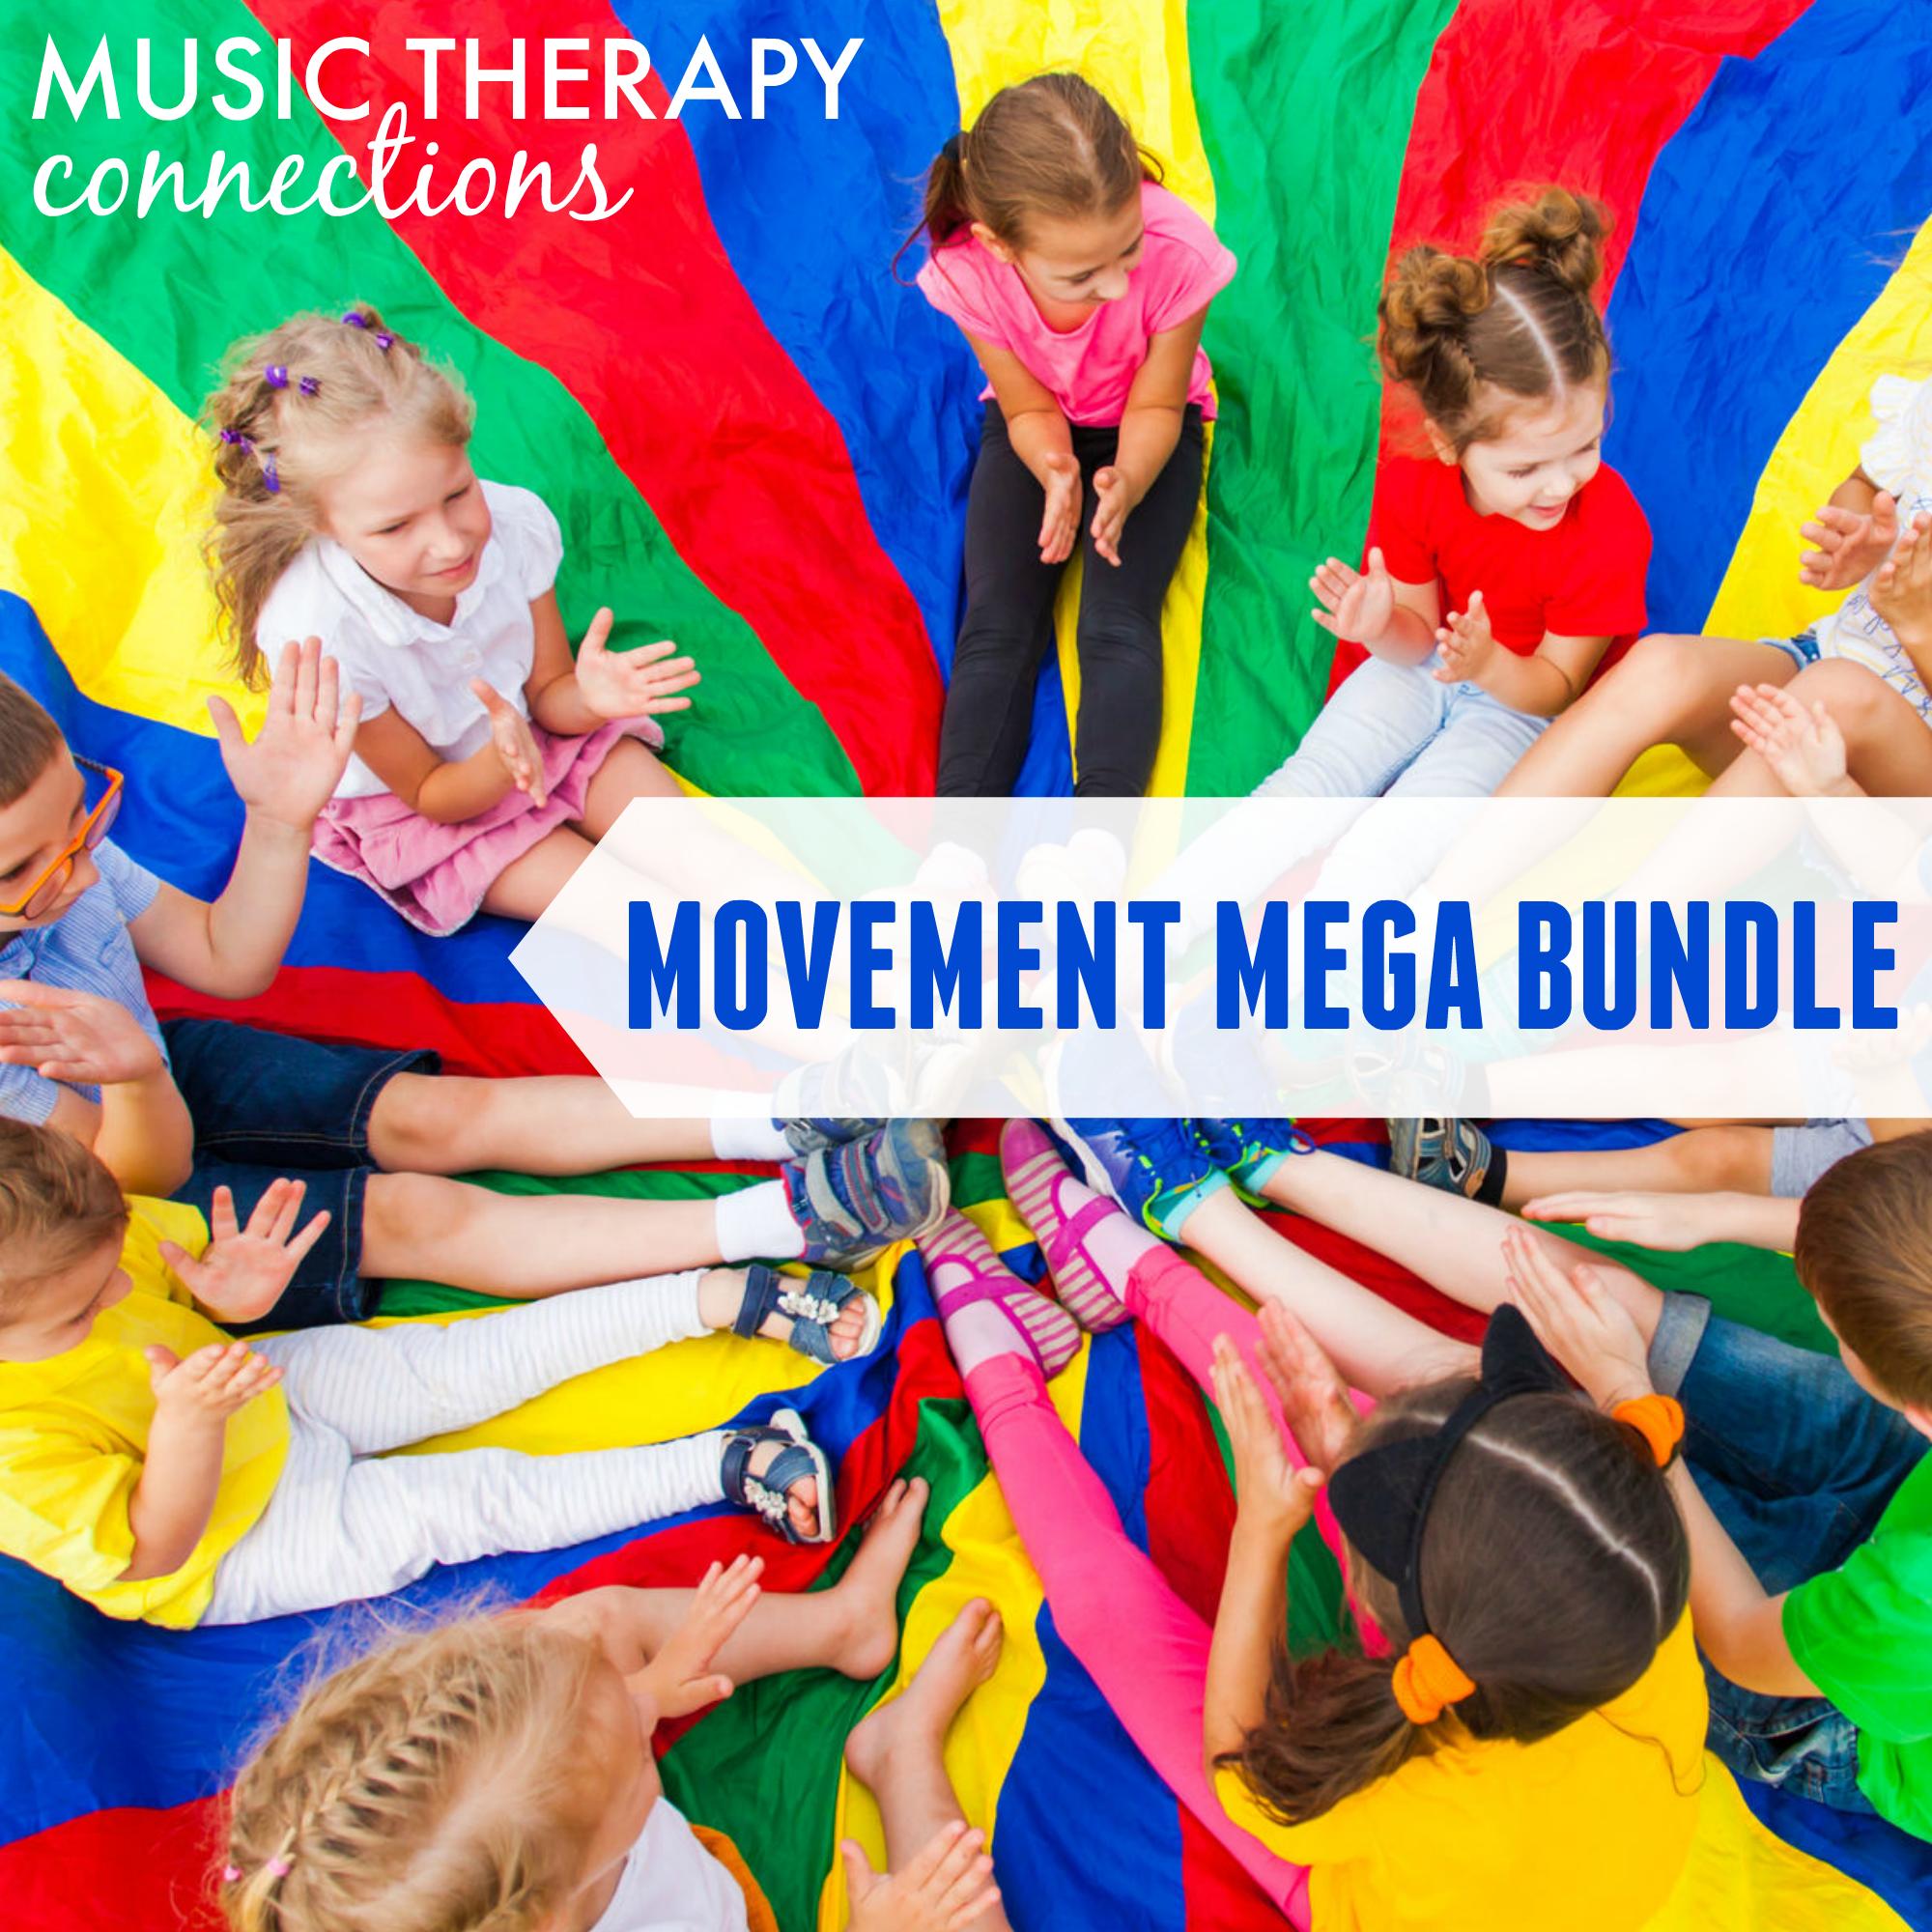 Movement Mega Bundle